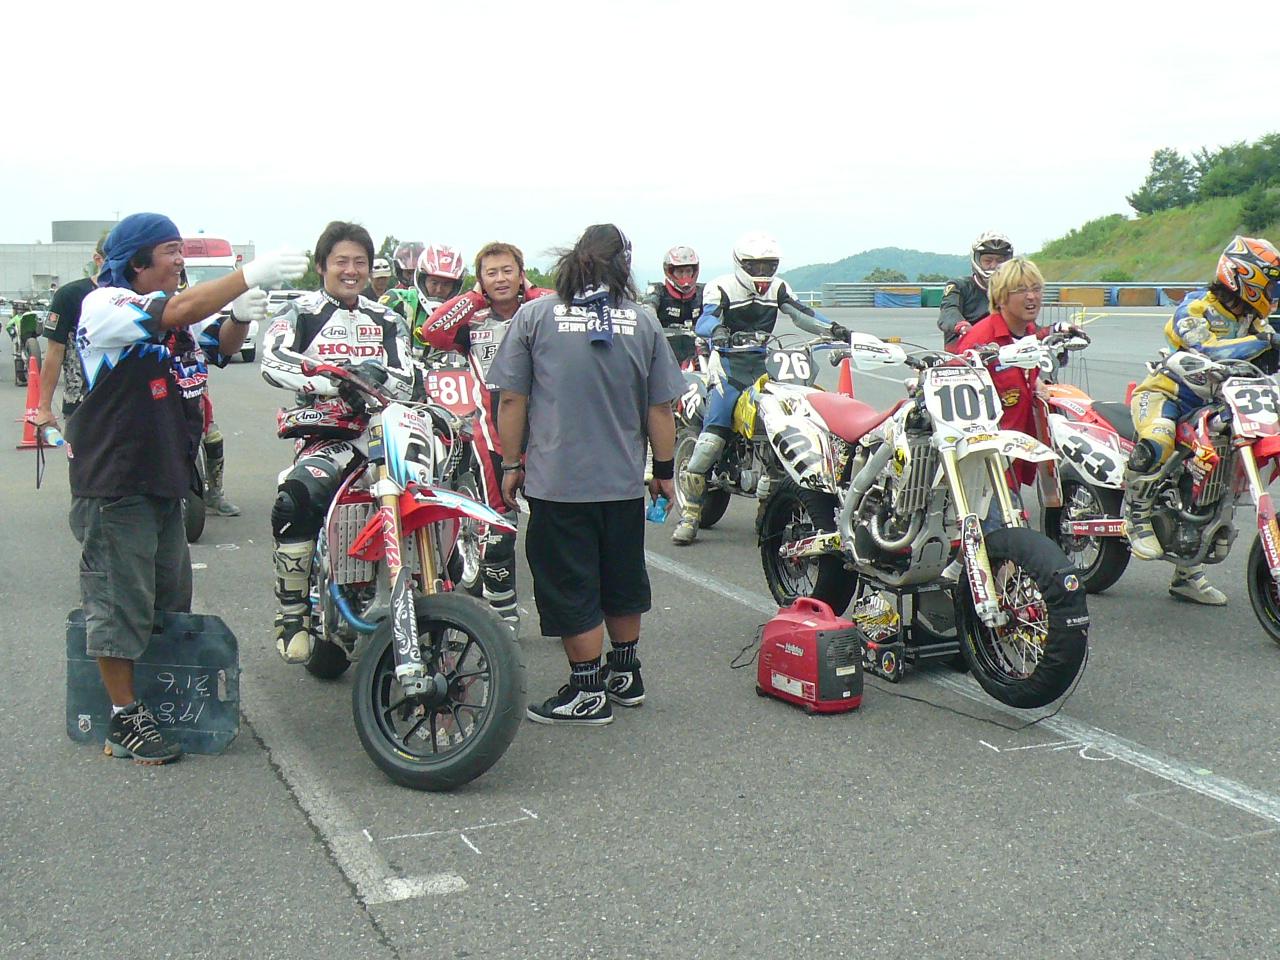 http://img.blogs.yahoo.co.jp/ybi/1/13/f5/tetsutaro499/folder/420377/img_420377_48744748_1?1248102563